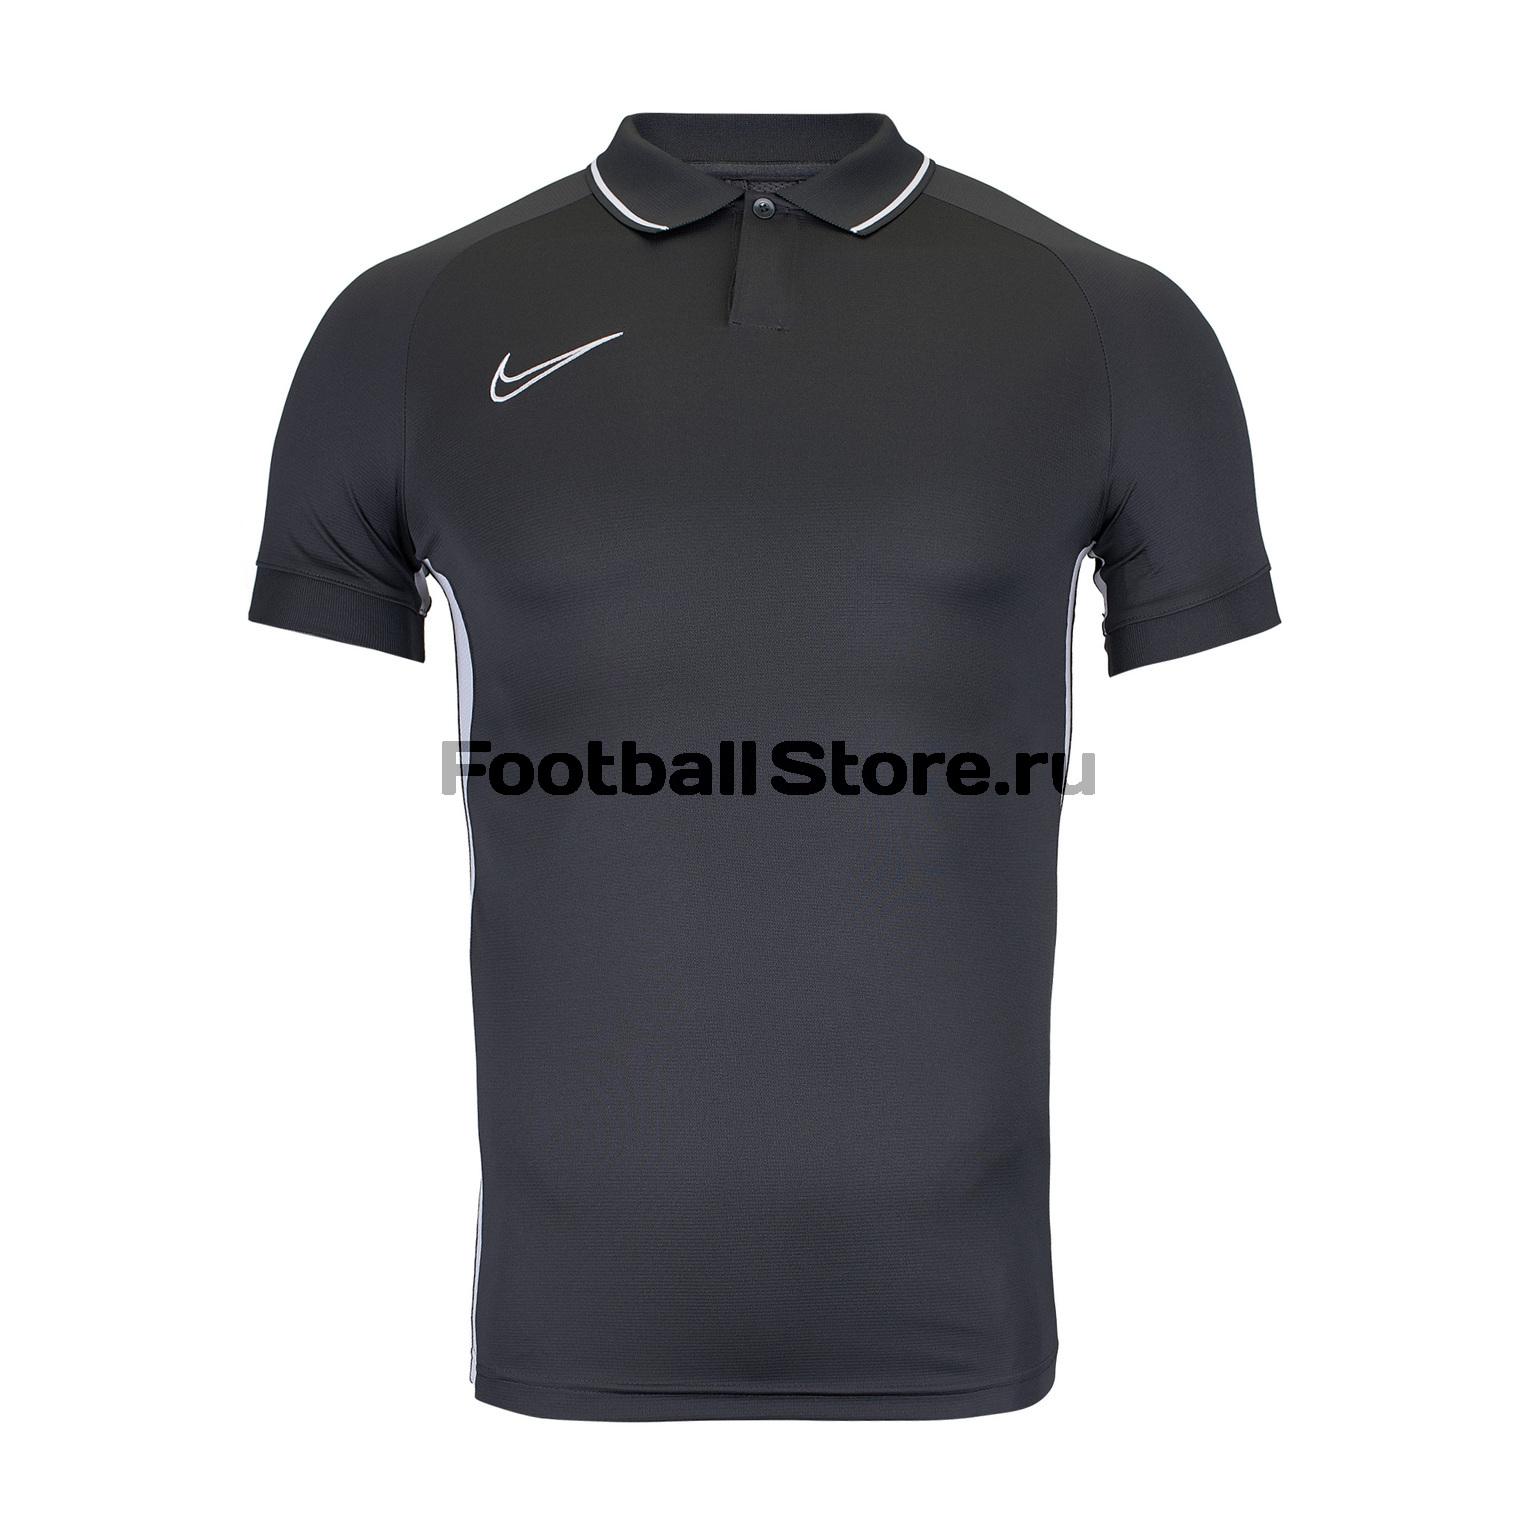 Поло Nike Dry Academy19 Polo BQ1496-060 цена